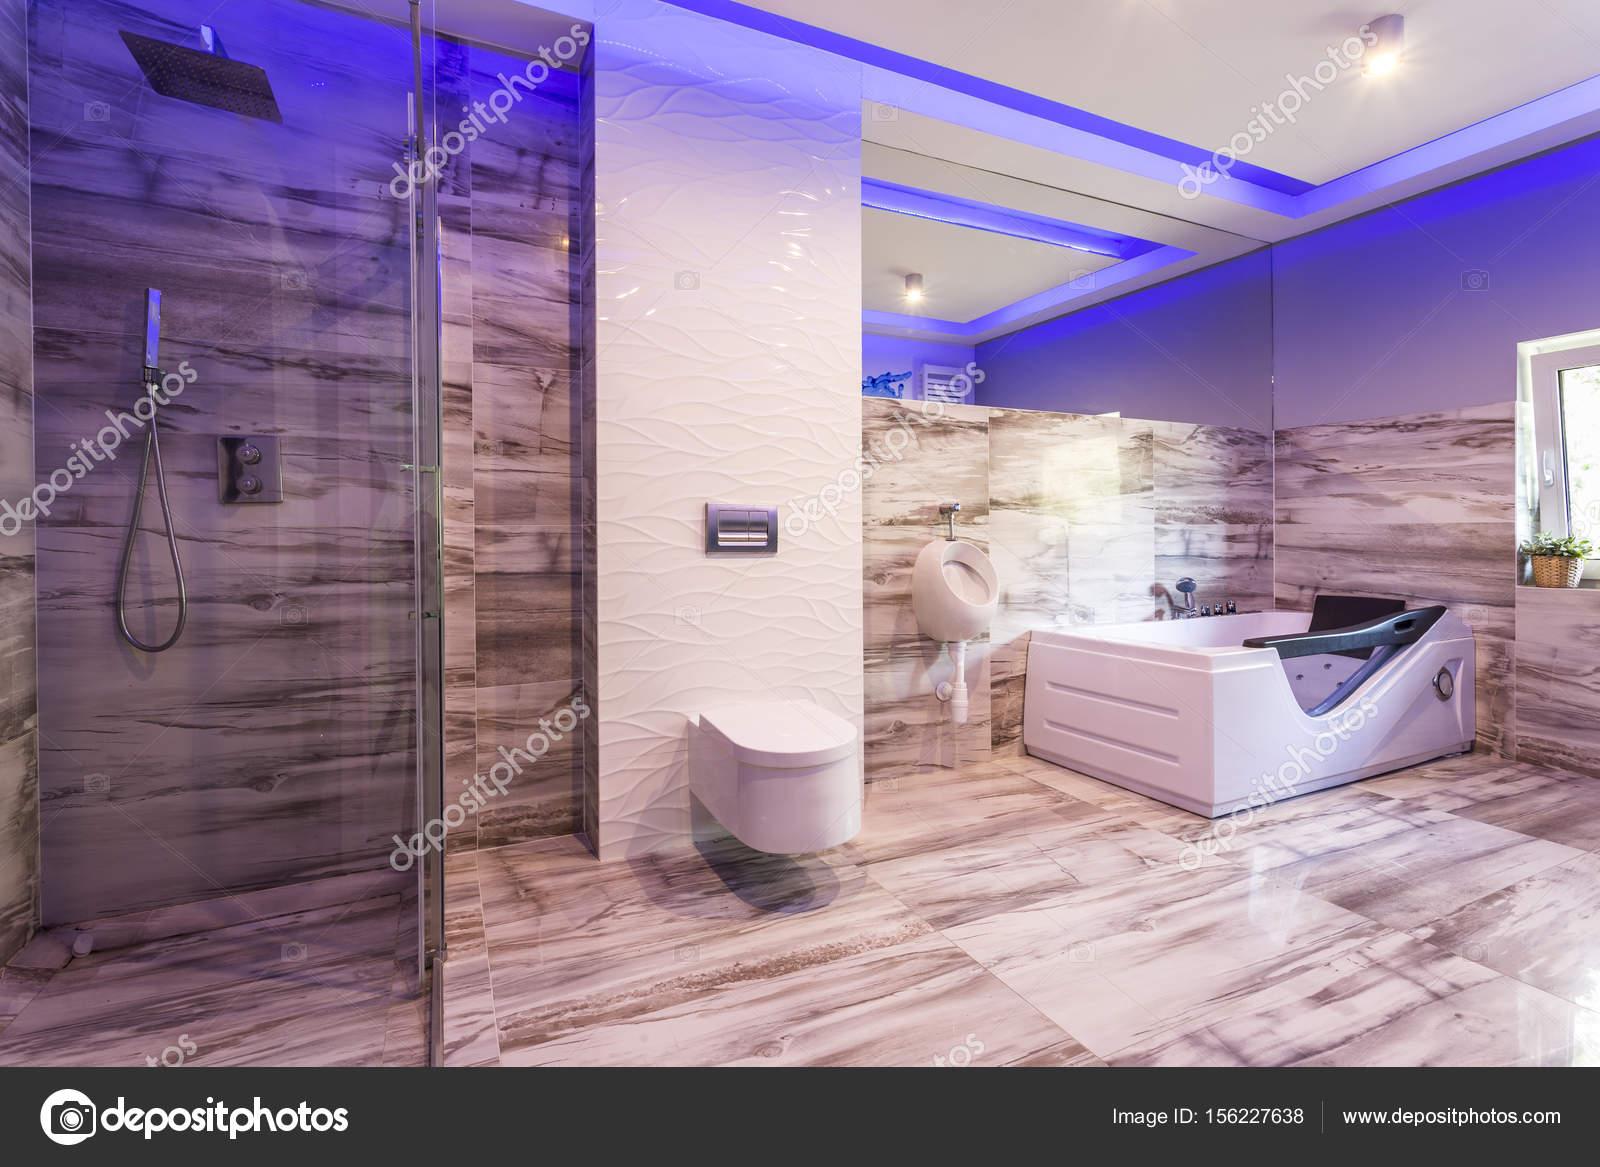 Marmer Tegels Badkamer : Badkamer met marmeren tegels en glas douchecabine u stockfoto